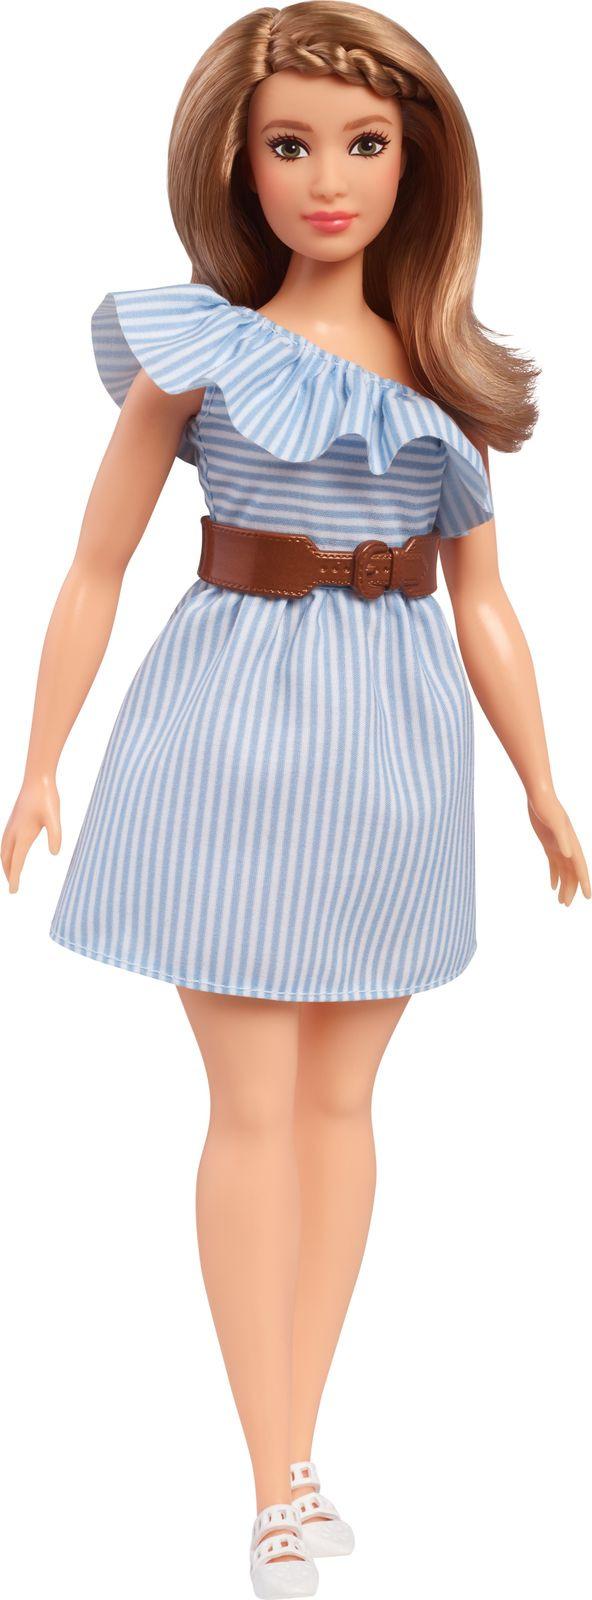 Barbie Кукла Fashionistas FBR37_FJF41 barbie кукла starlight adventure барби с ховербордом dlt23